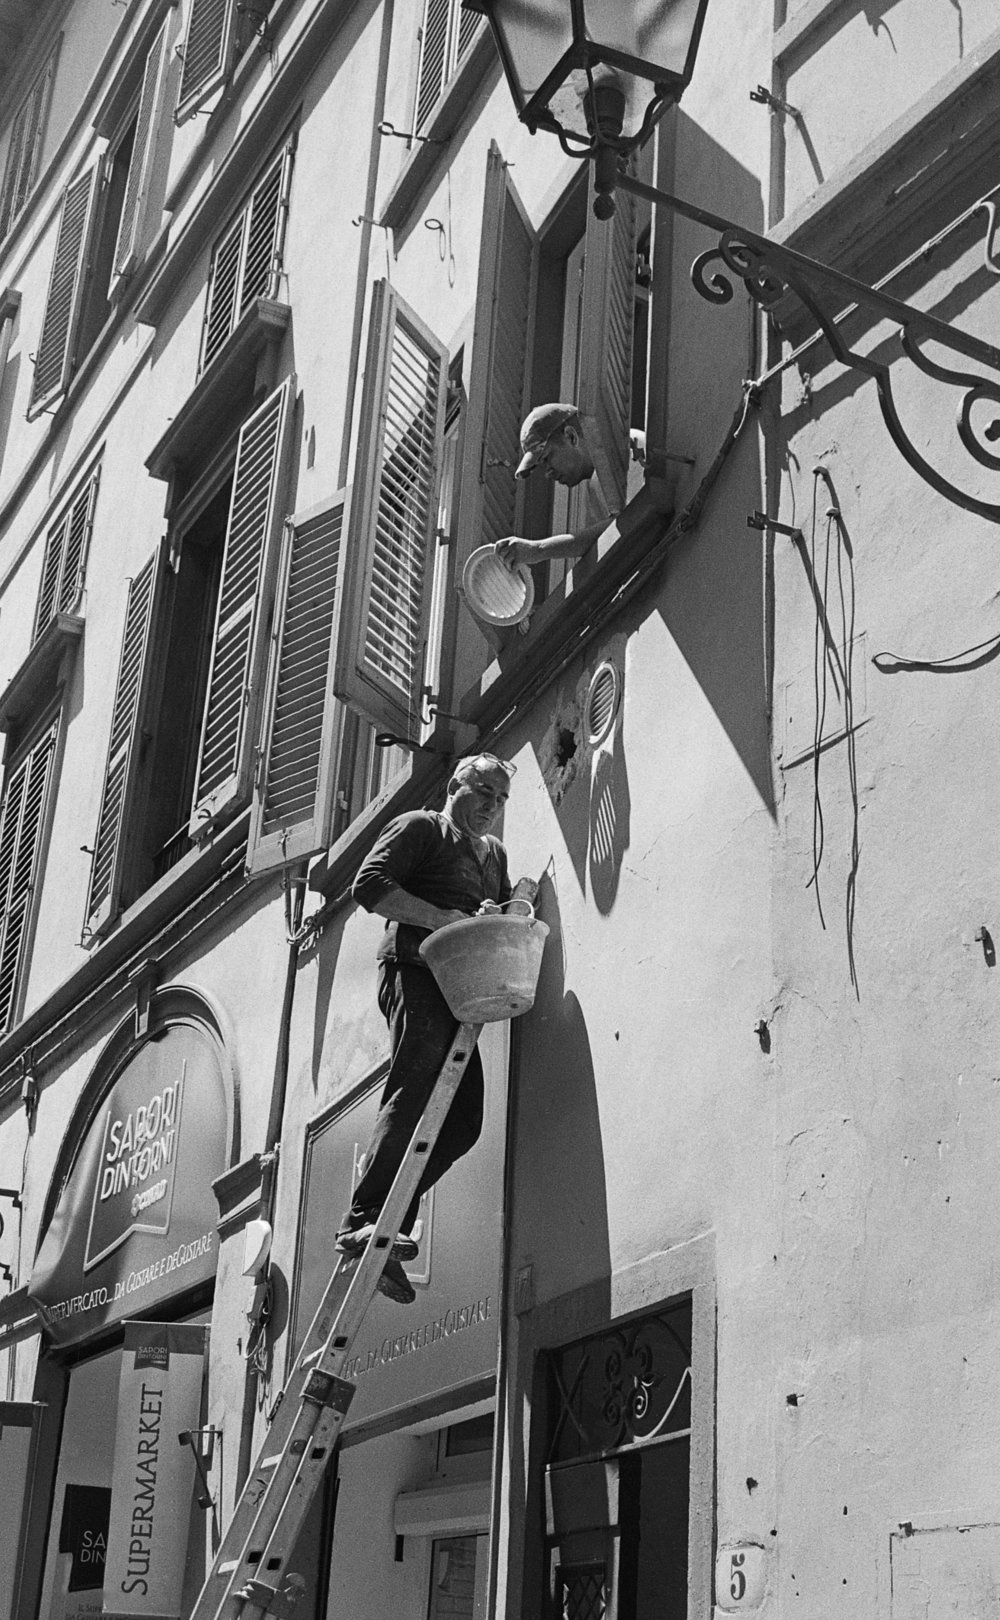 Italy008.jpg